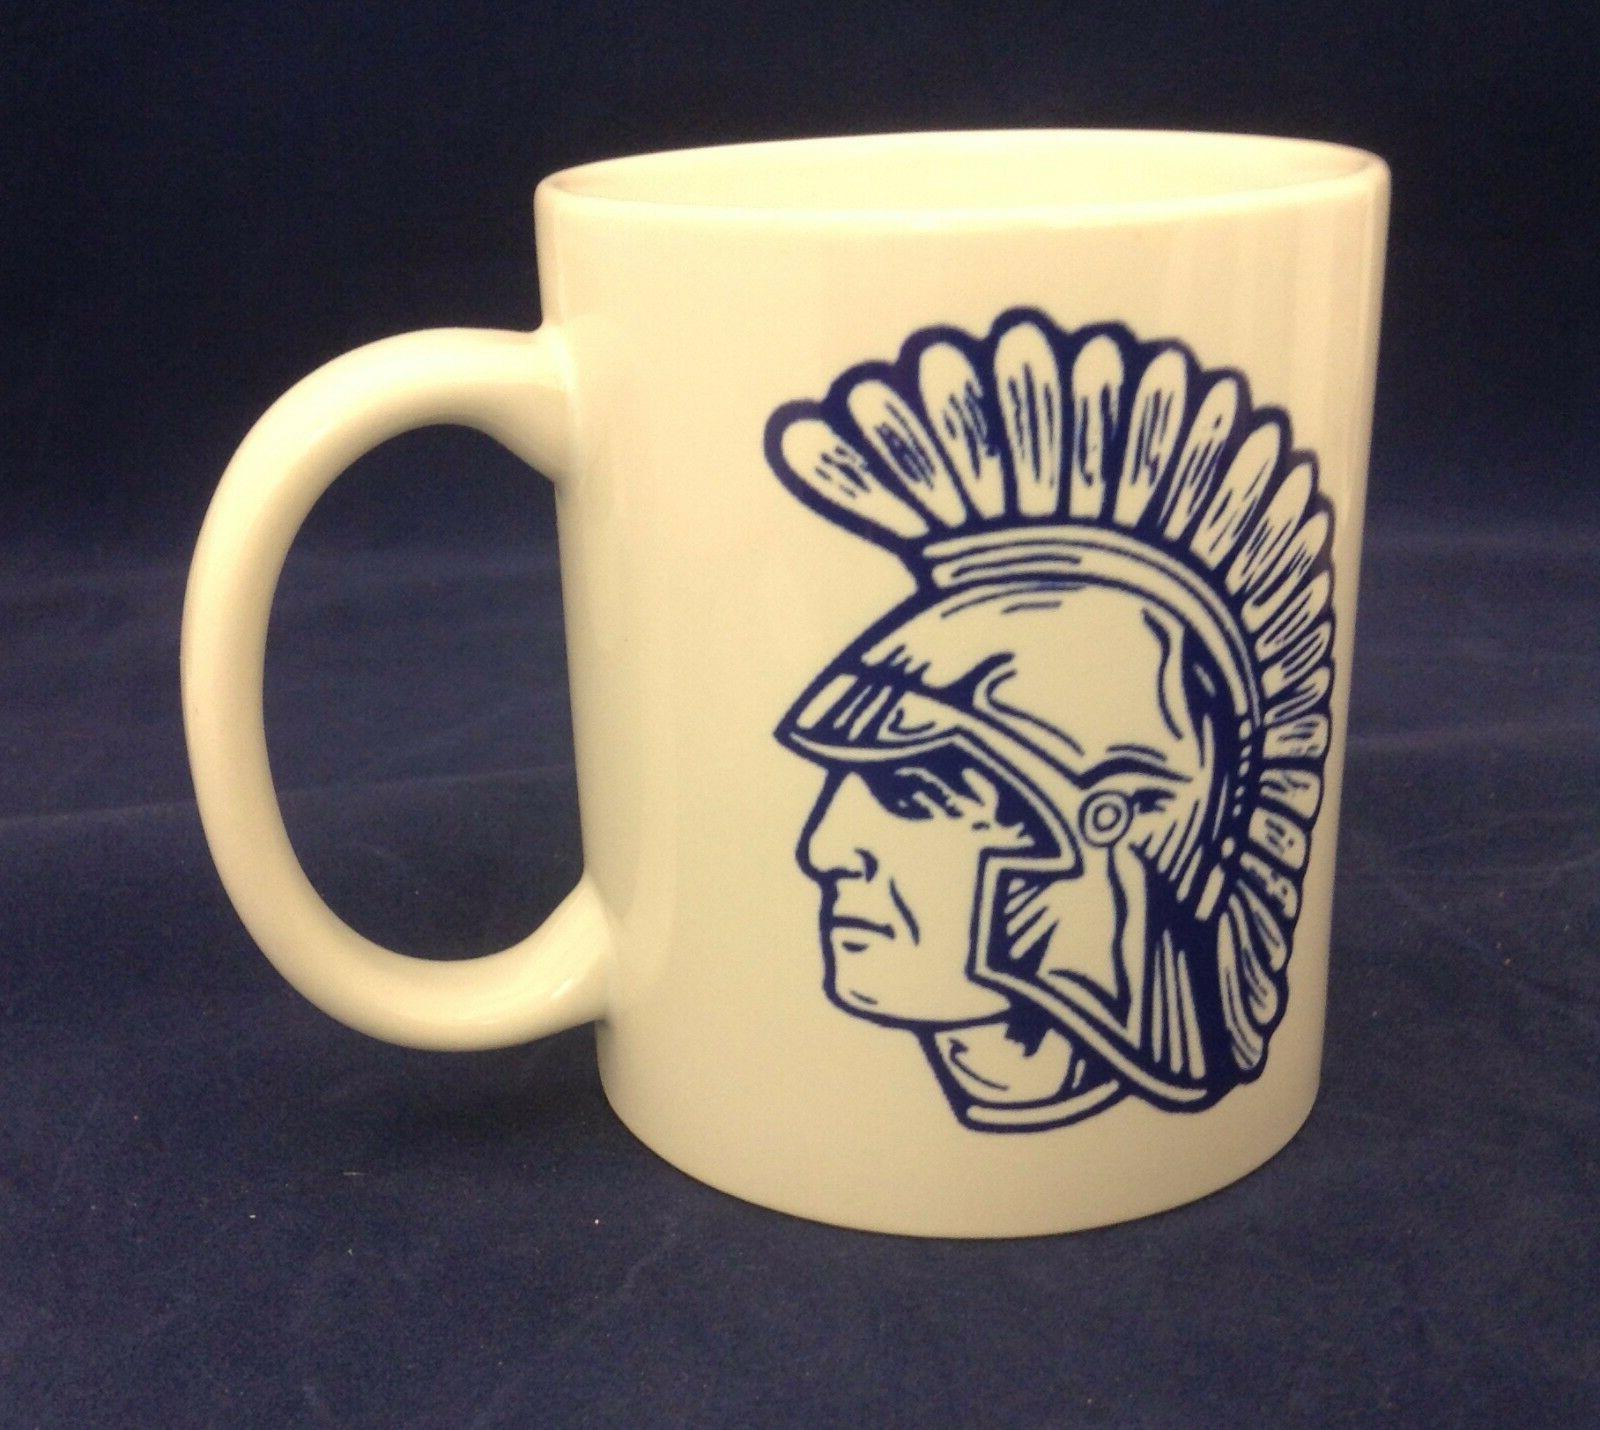 Personalized Coffee Mug Custom Printed